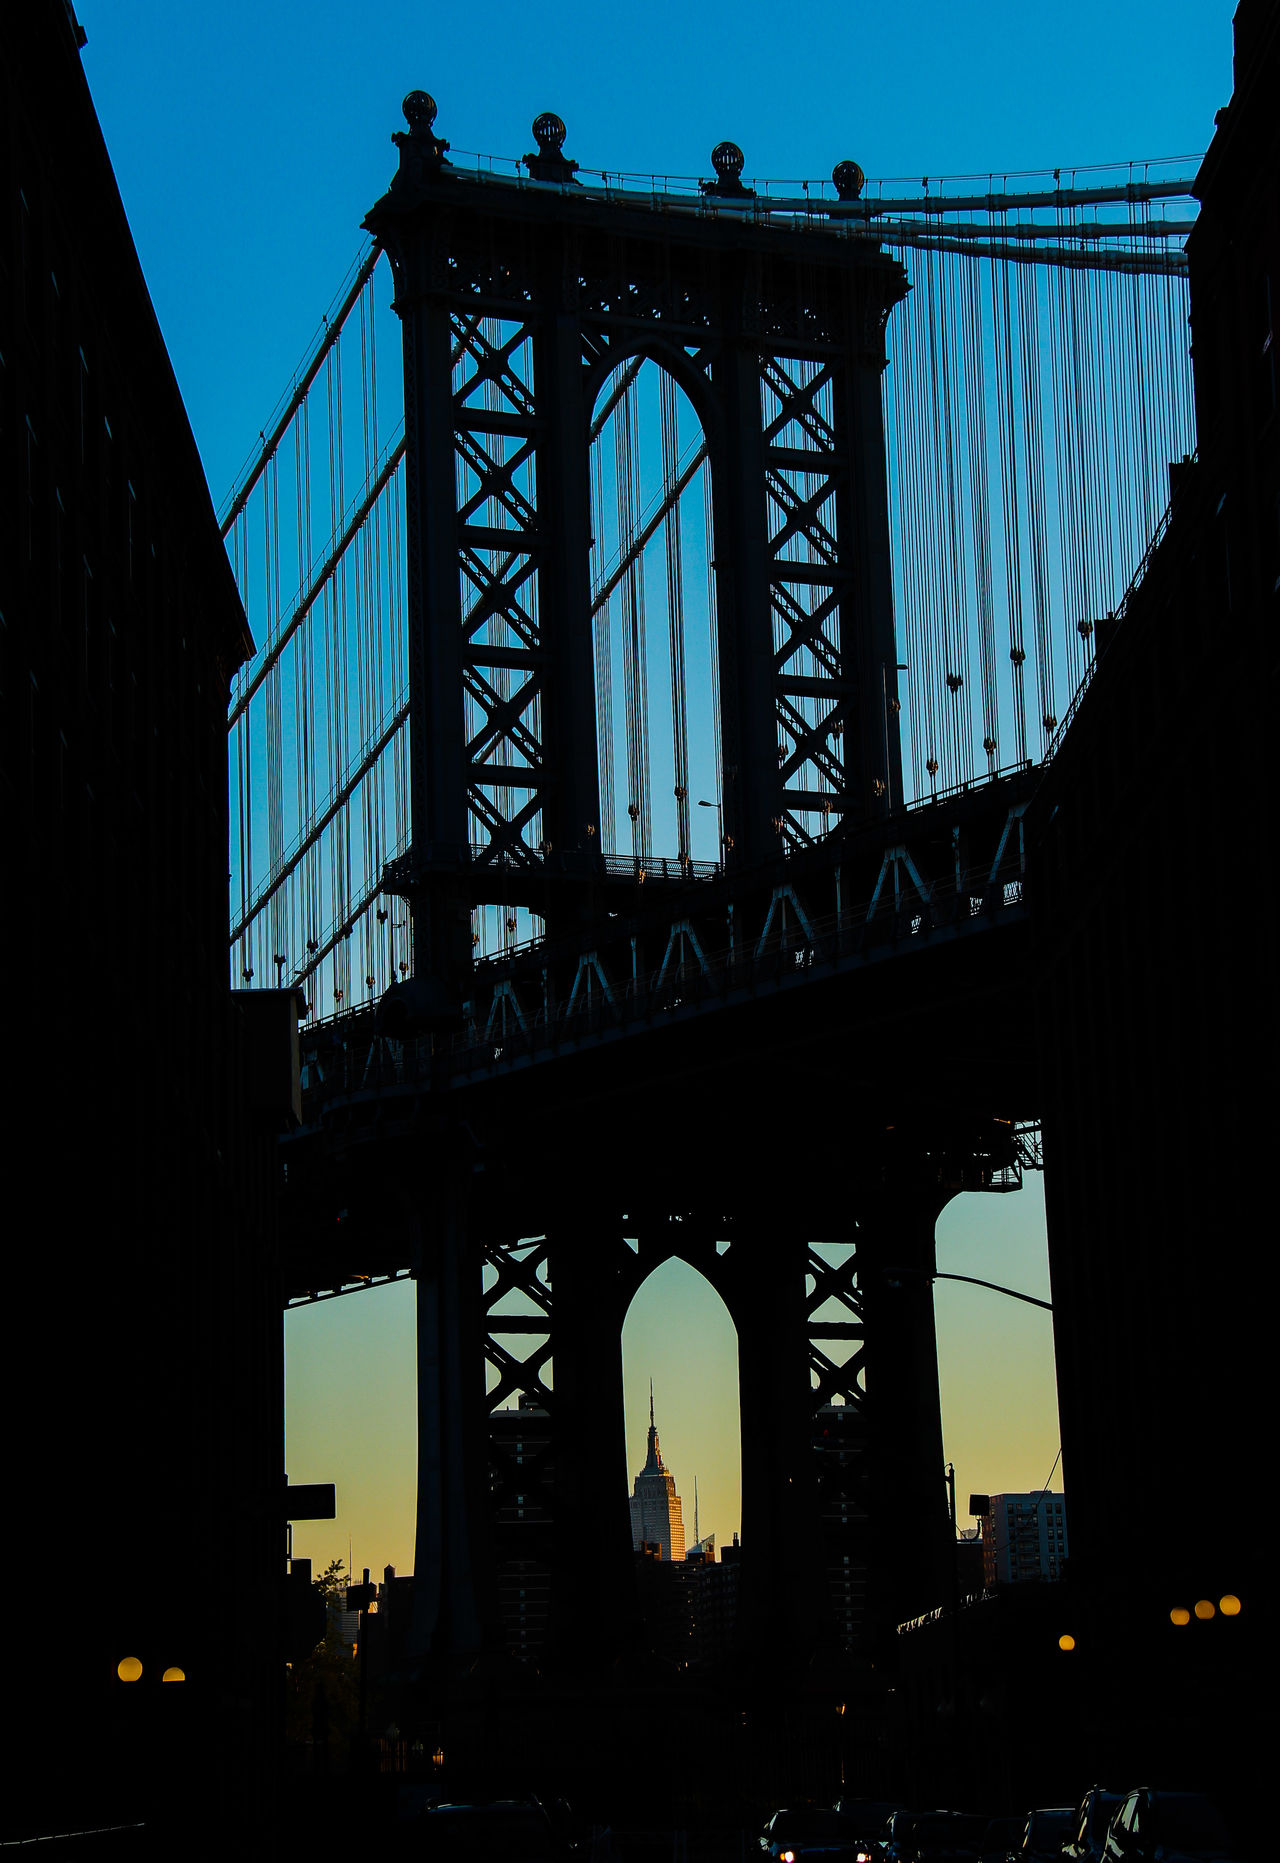 Manatthan Bridge Silhouette